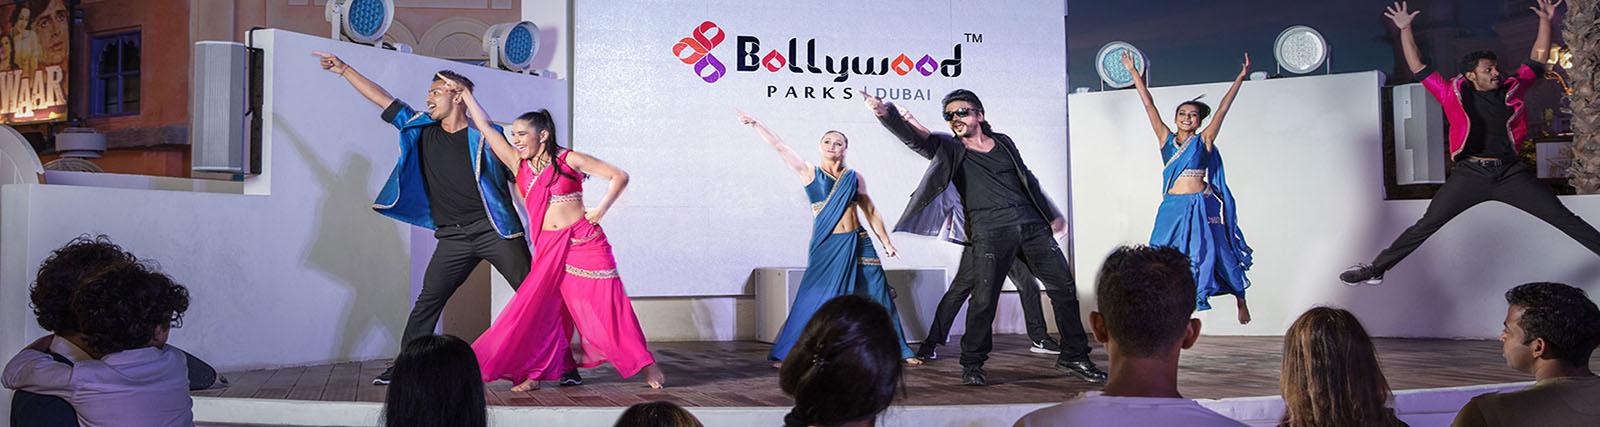 Raj Mahal in Bollywood Parks Dubai